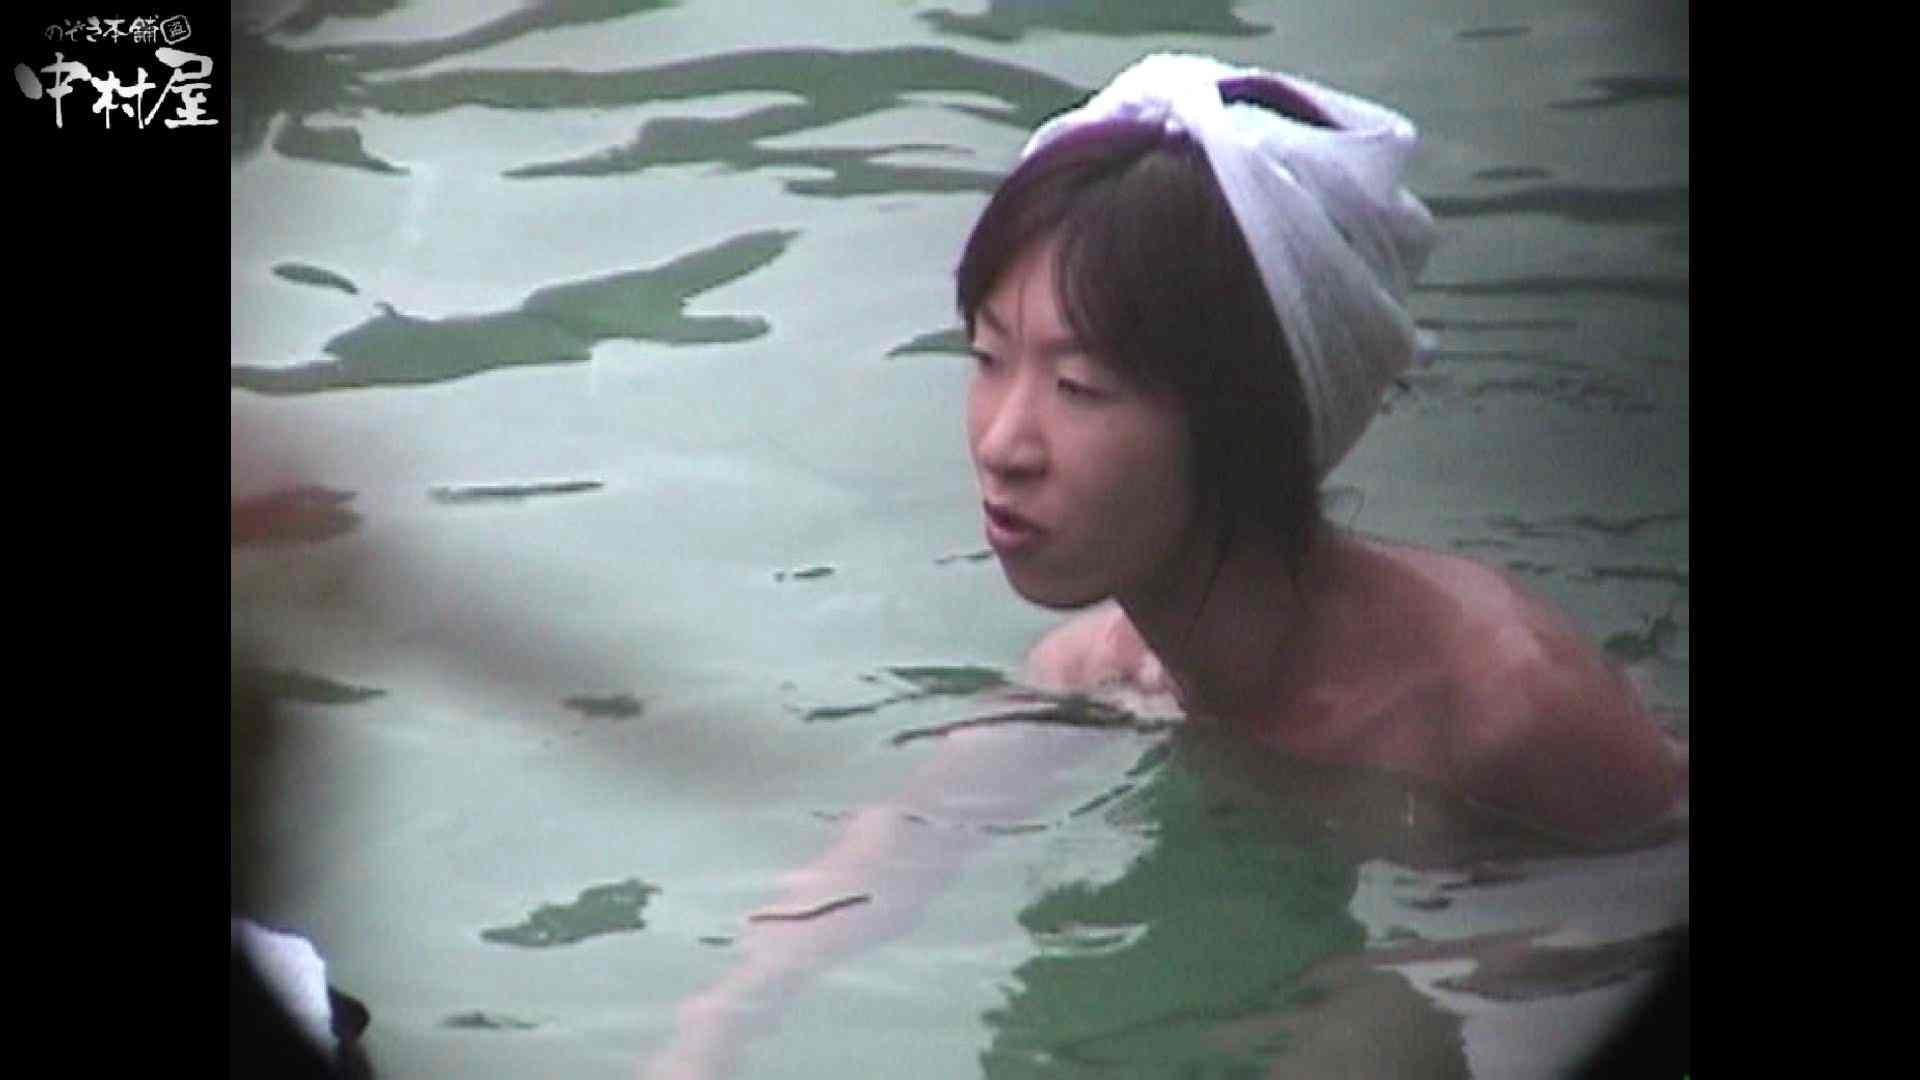 Aquaな露天風呂Vol.952 盗撮  106連発 6